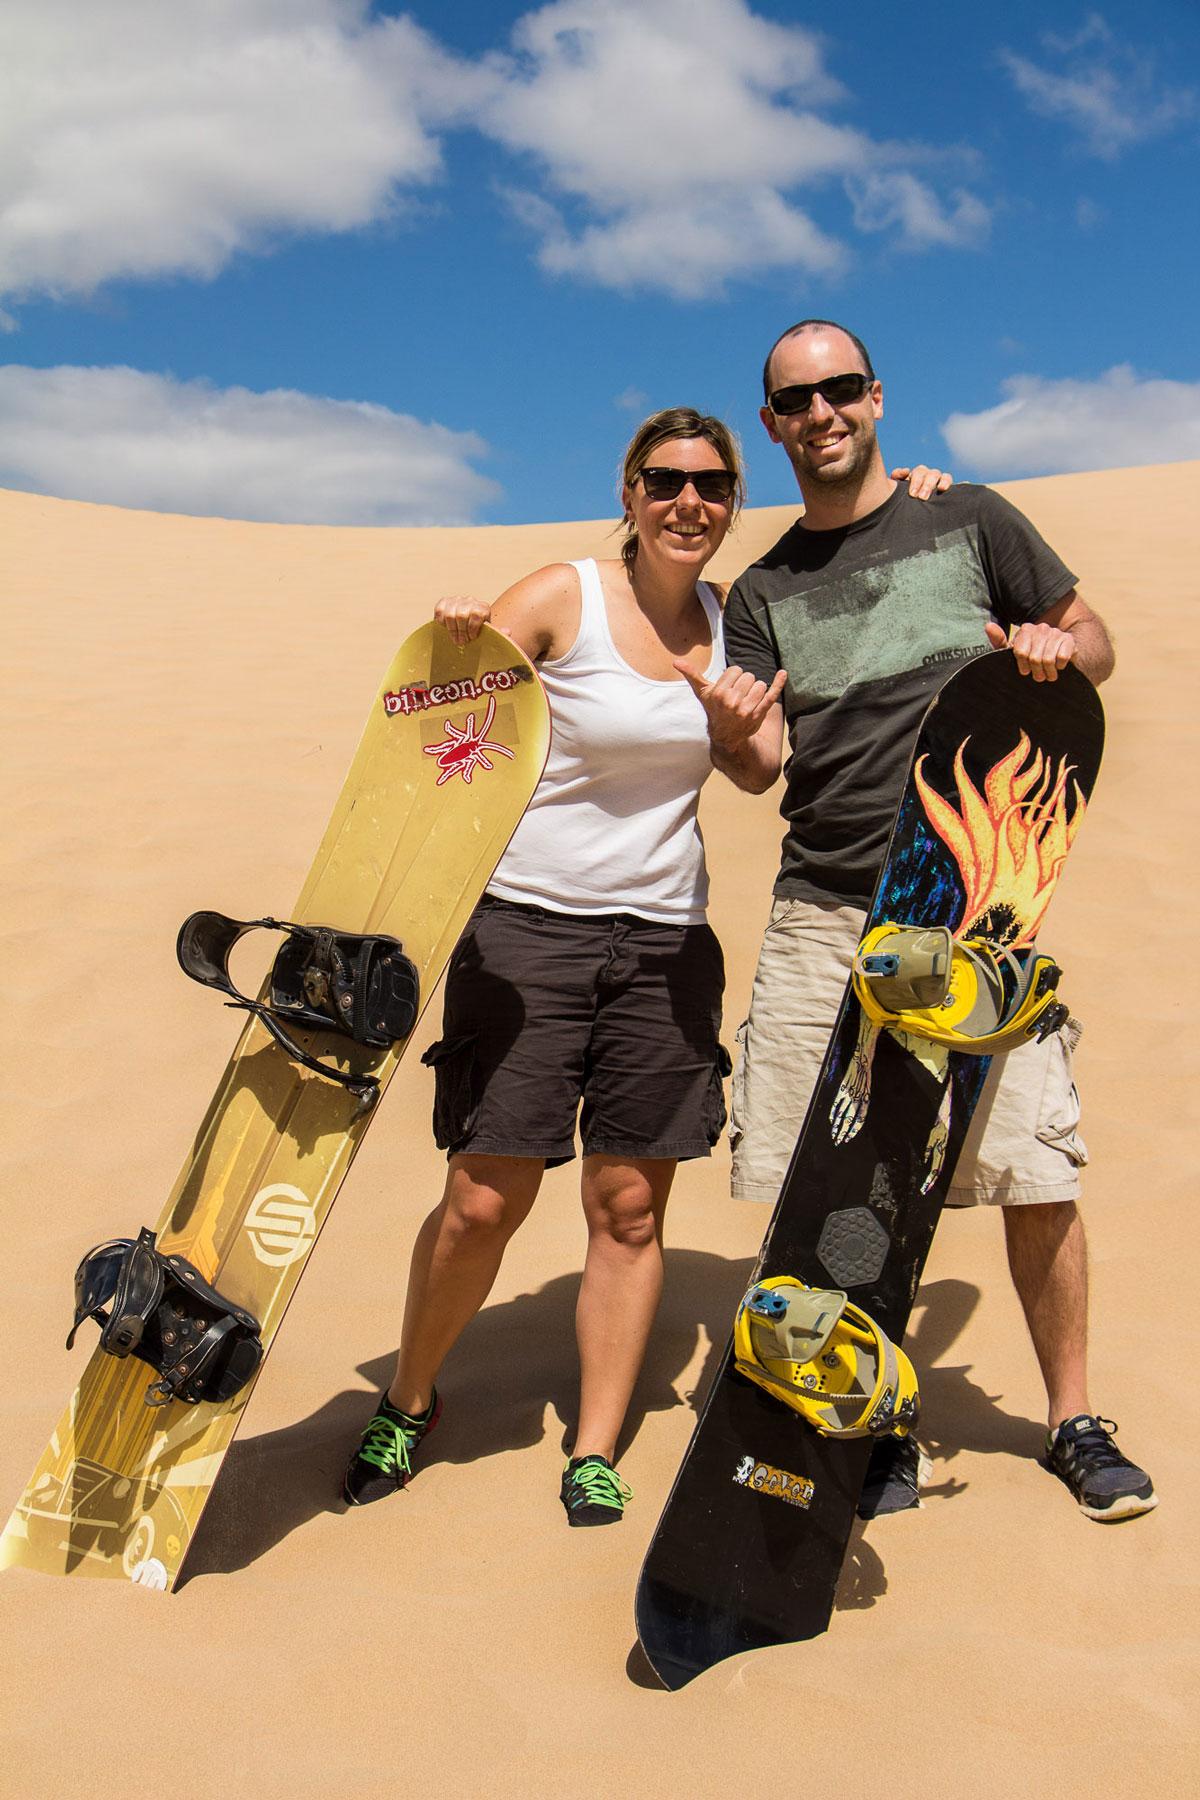 sandboarding-dragon-dune-michi-katrin